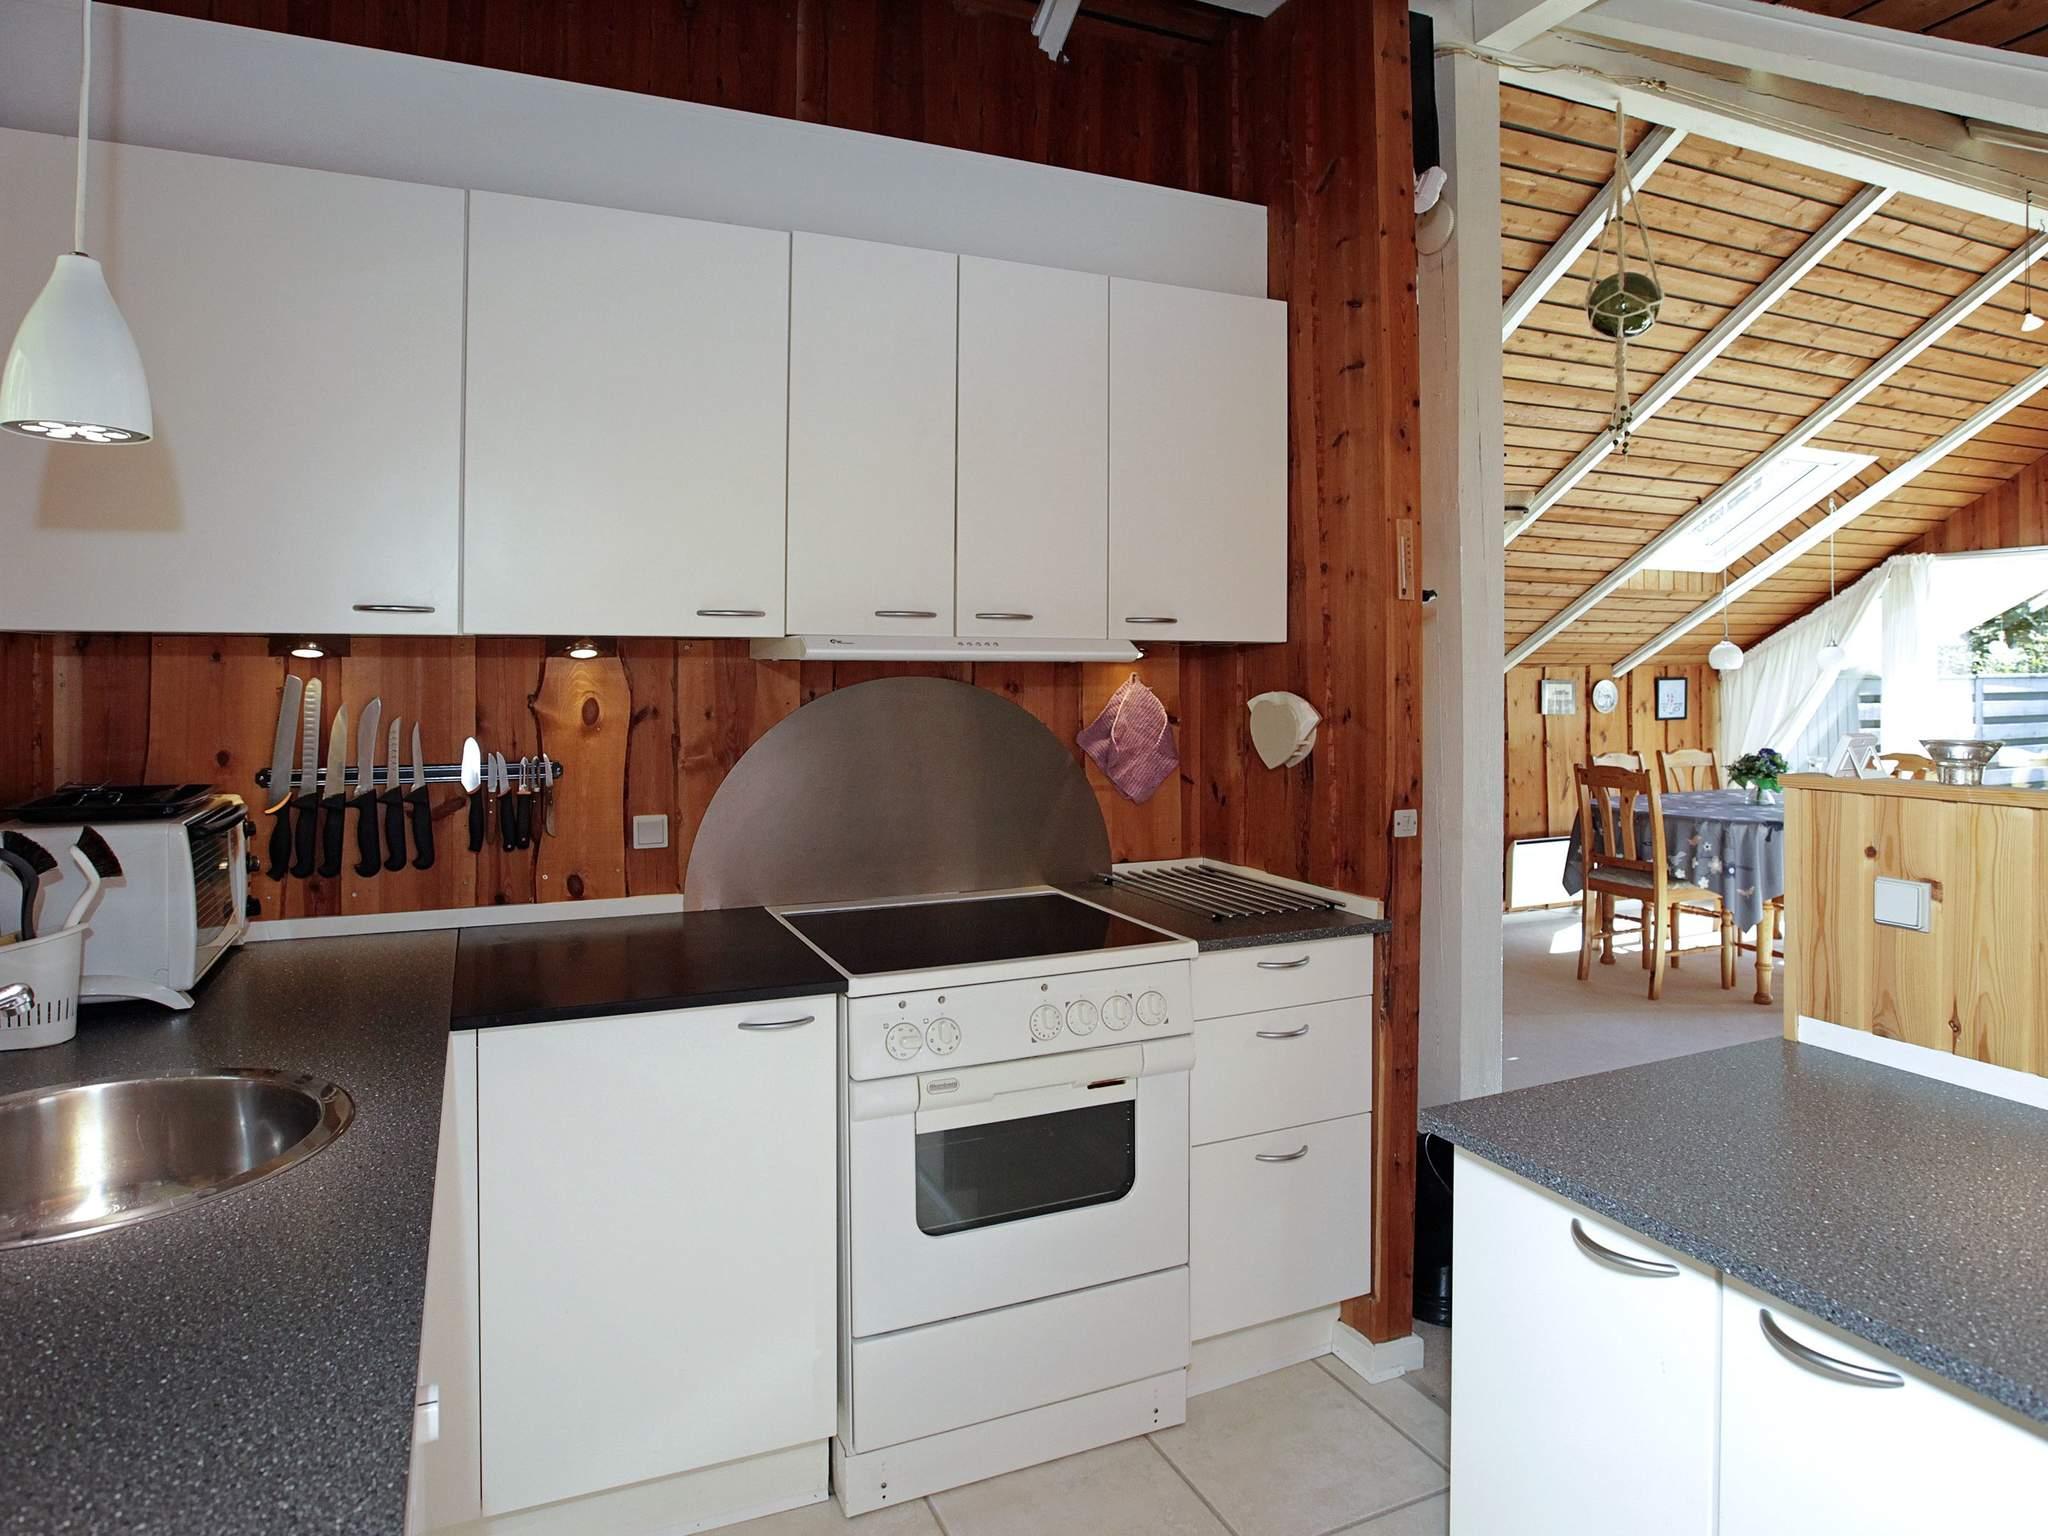 Ferienhaus Hou Nord/Melholt (88048), Hou, , Nordostjütland, Dänemark, Bild 13